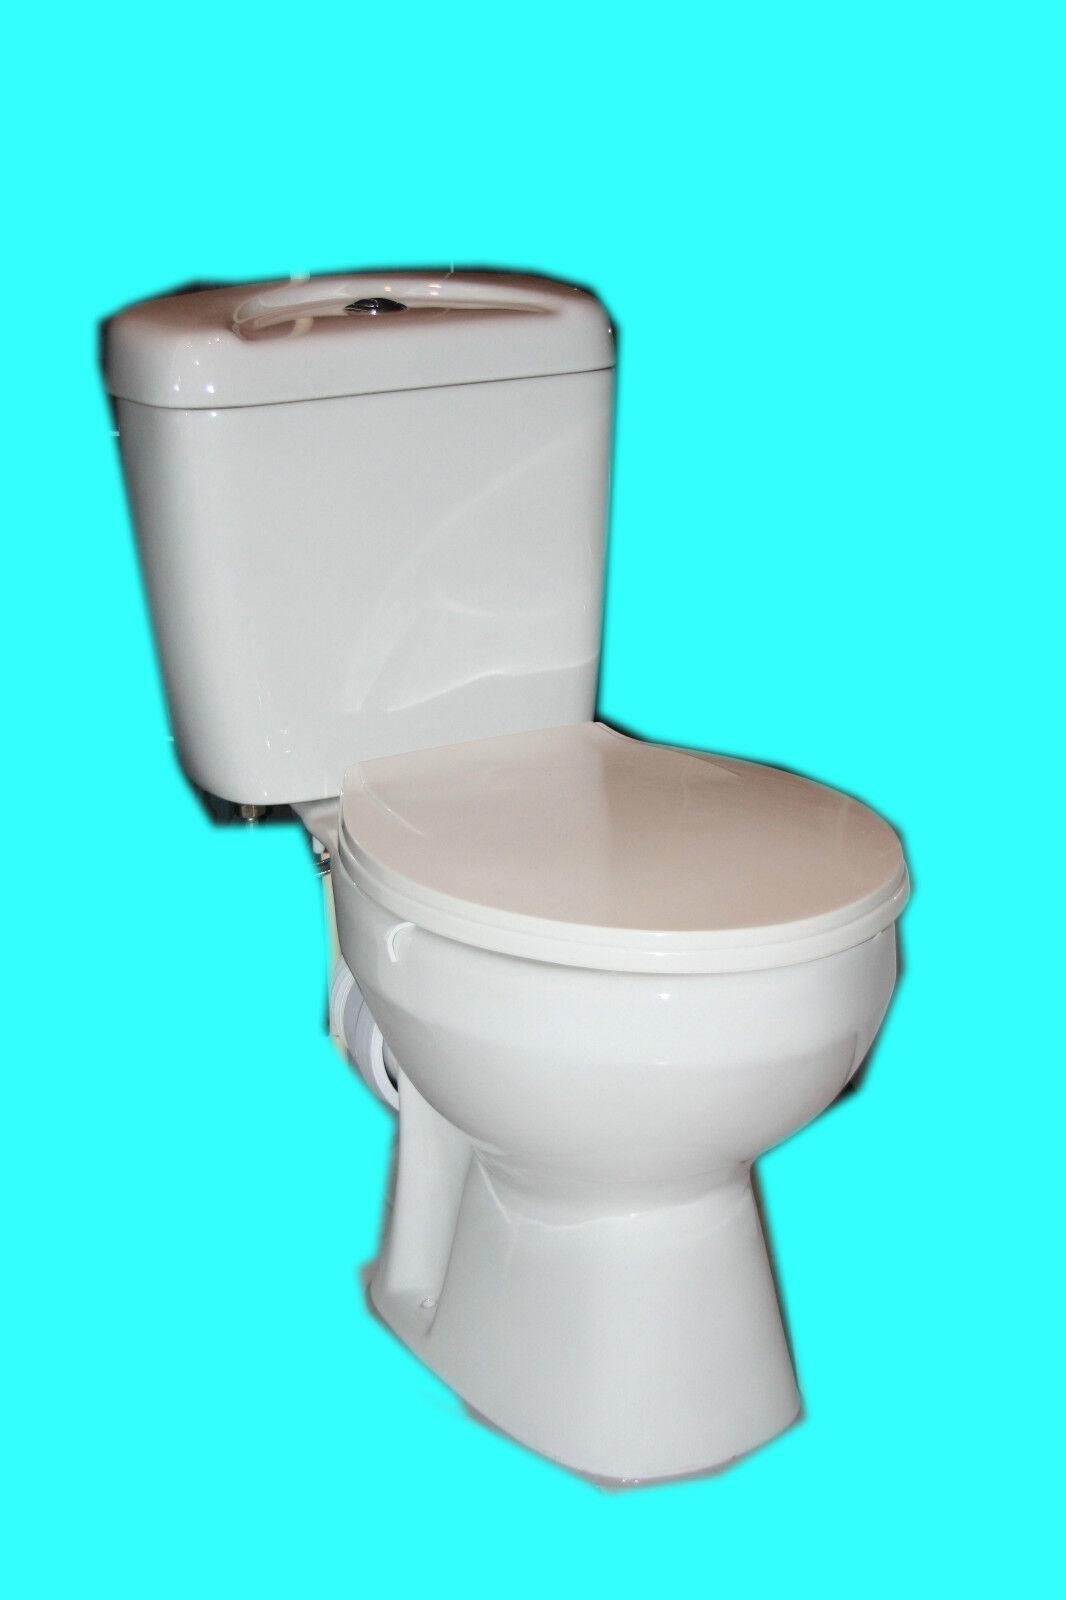 wc toilette stand komplett set mit sp lkasten komplett aus. Black Bedroom Furniture Sets. Home Design Ideas